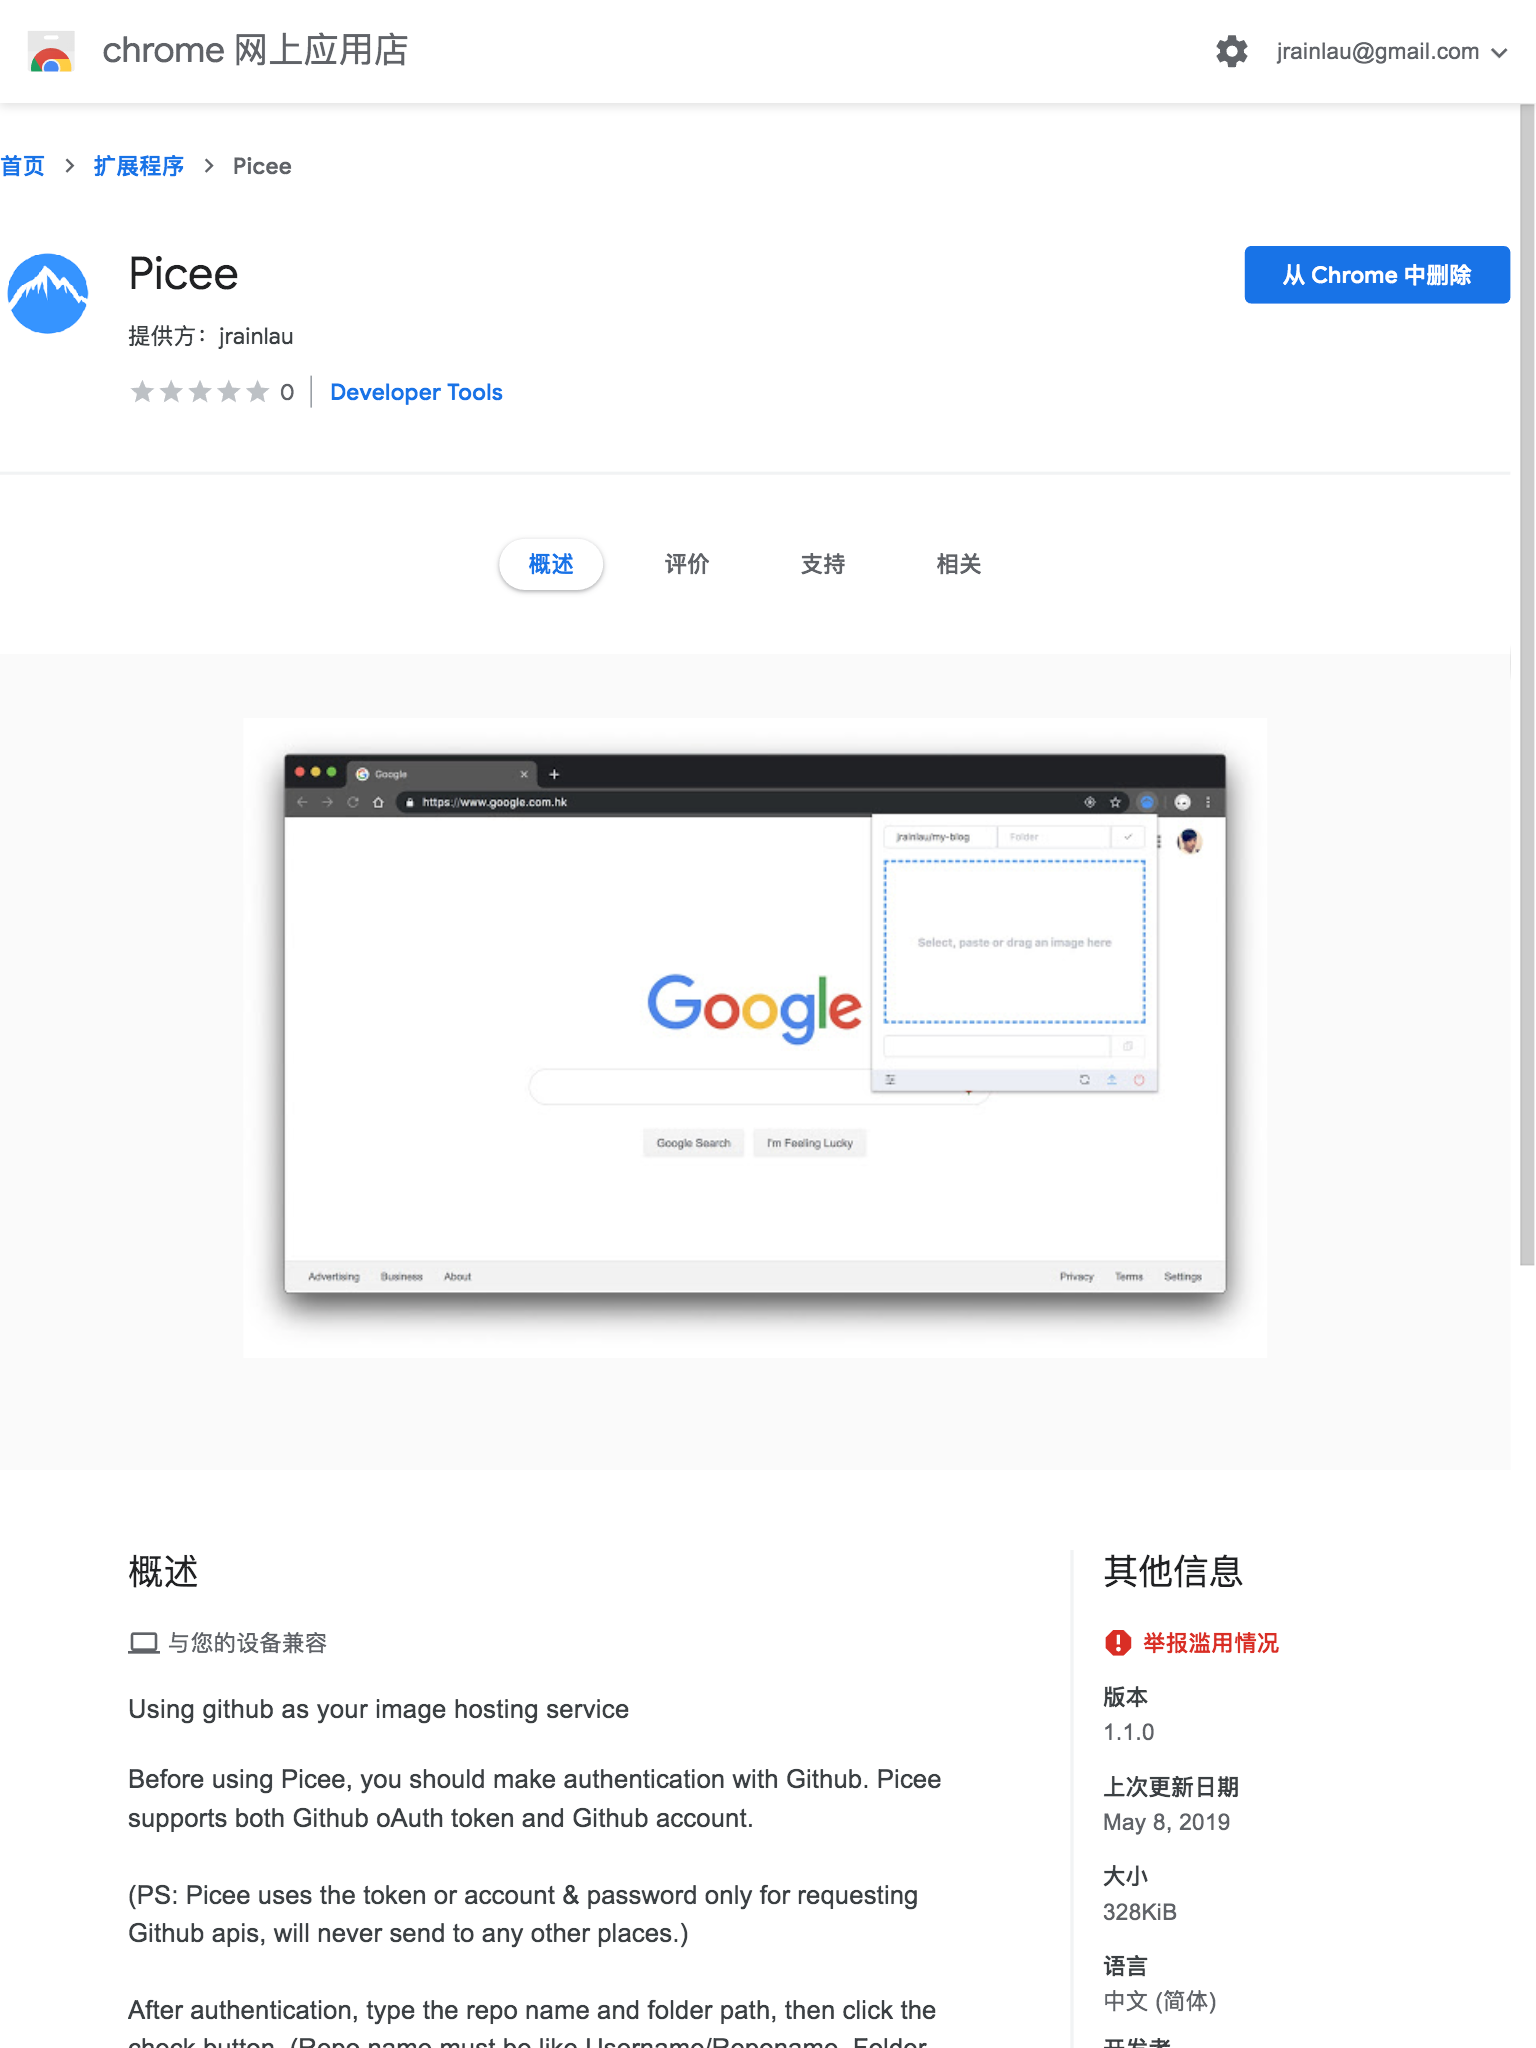 chrome google com_webstore_detail_picee_nmeeieecbmdnilkkaliknhkkakonobbc(iPad)